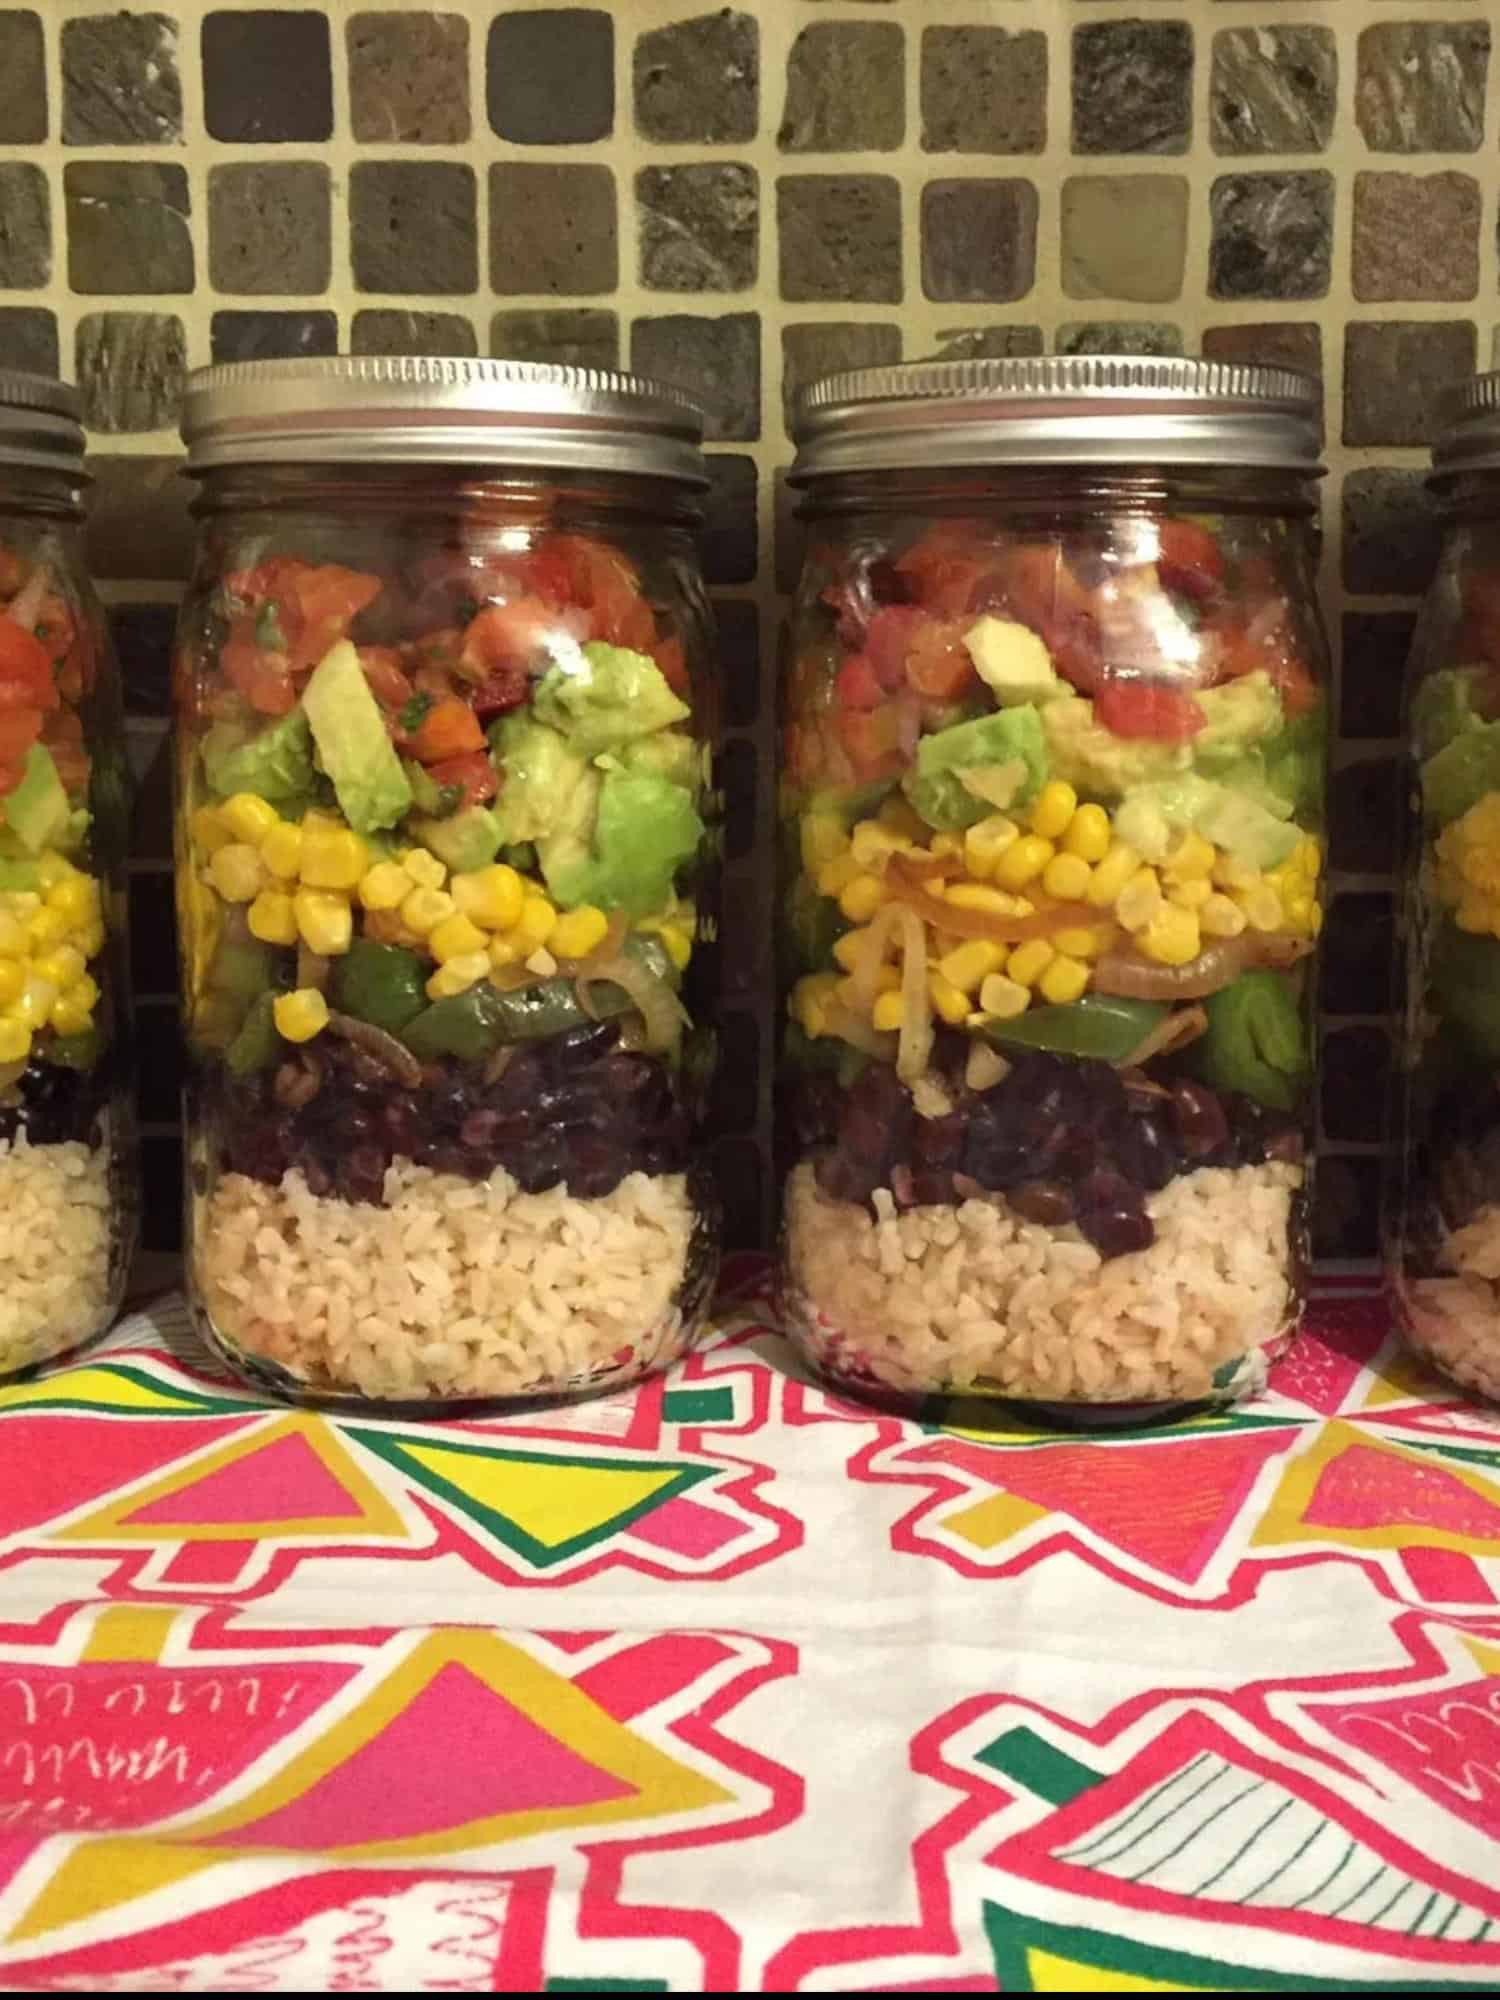 mason jar layered with rice, beans, corn, avocado and tomato.